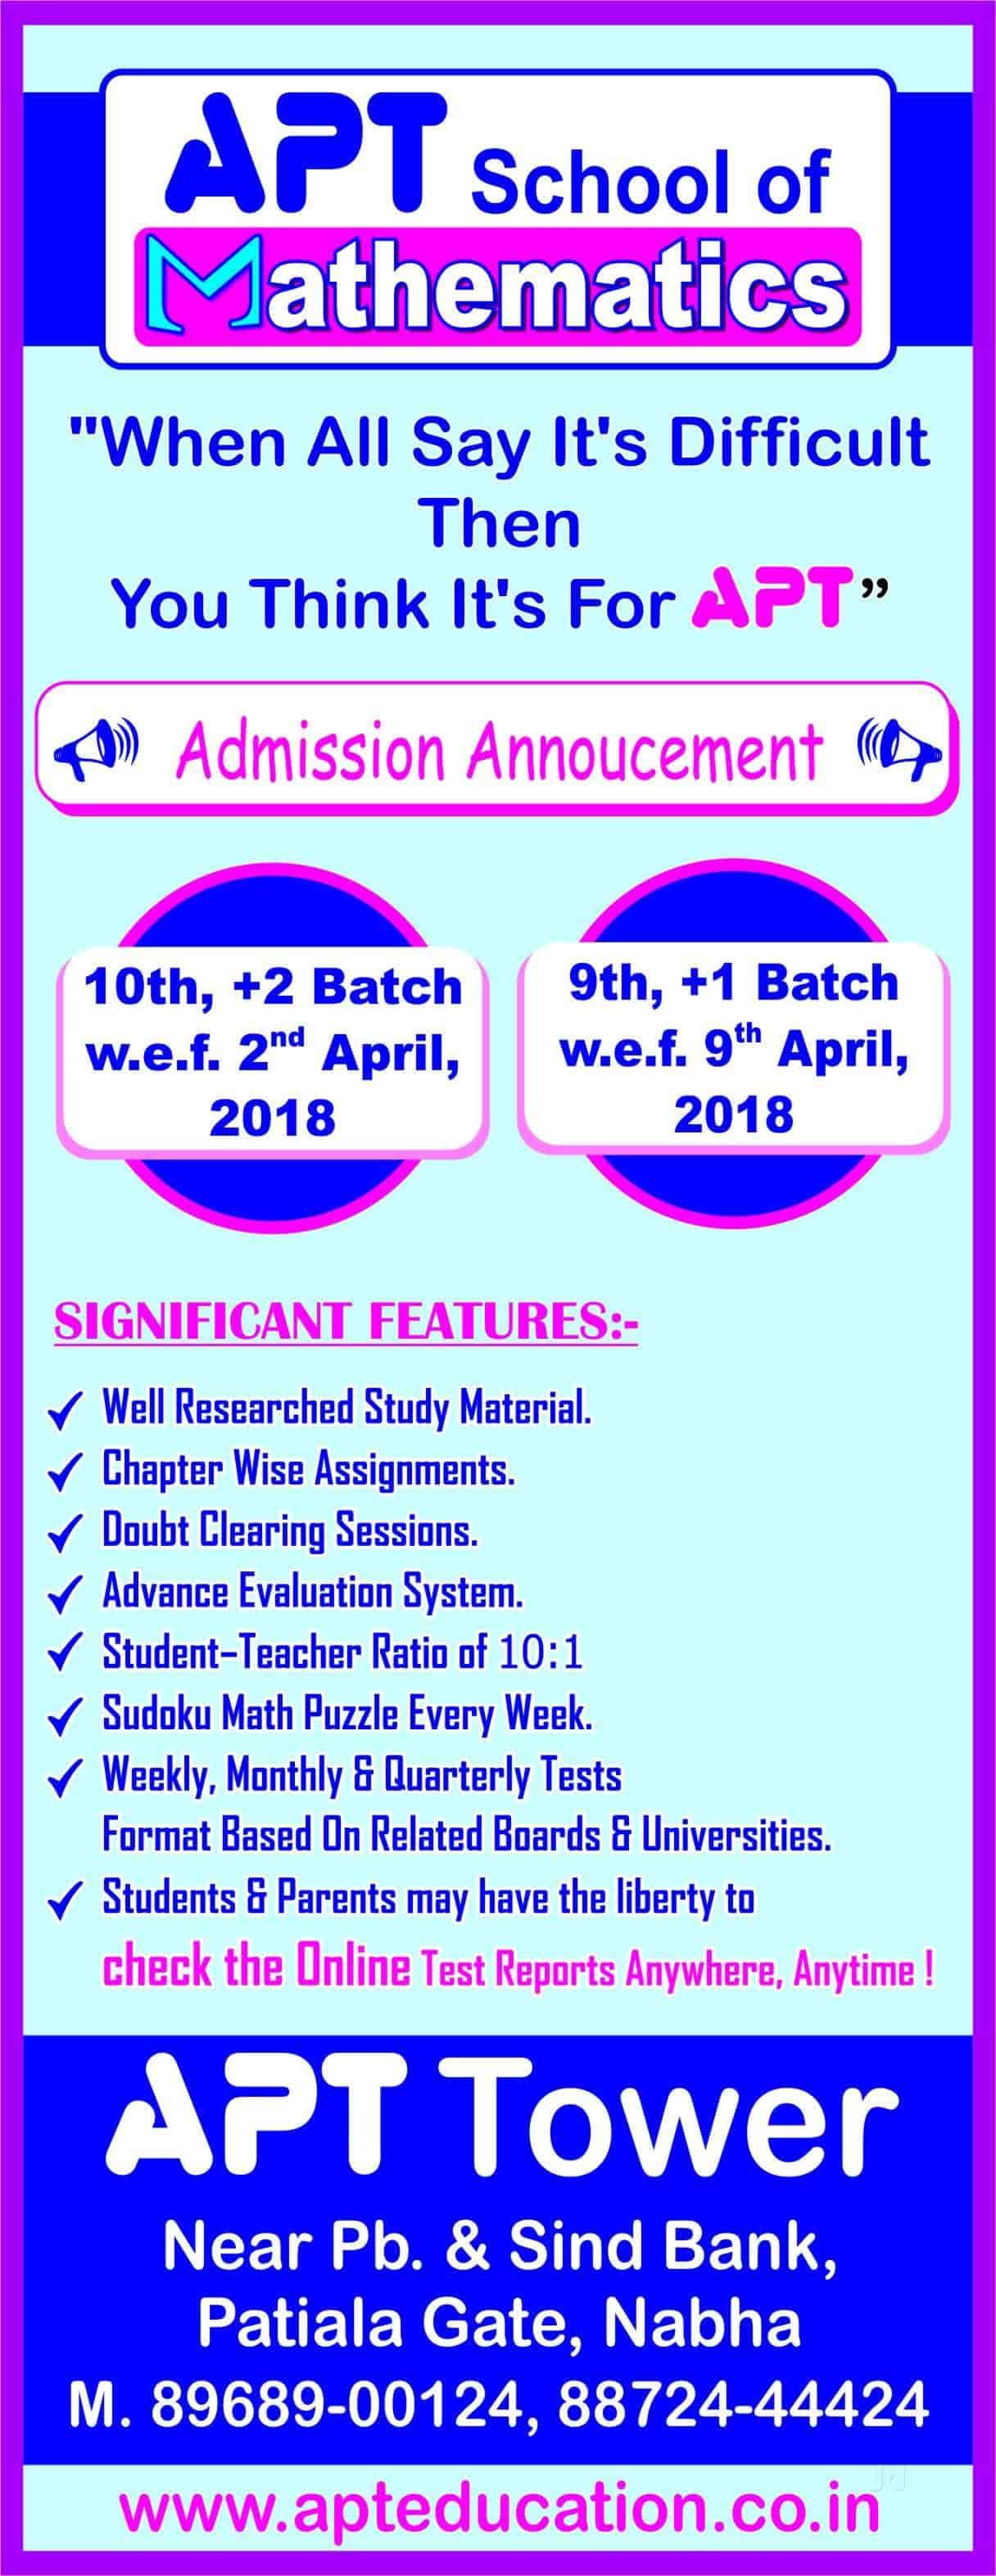 APT School Of Mathematics - Tutorials in Nabha - Justdial